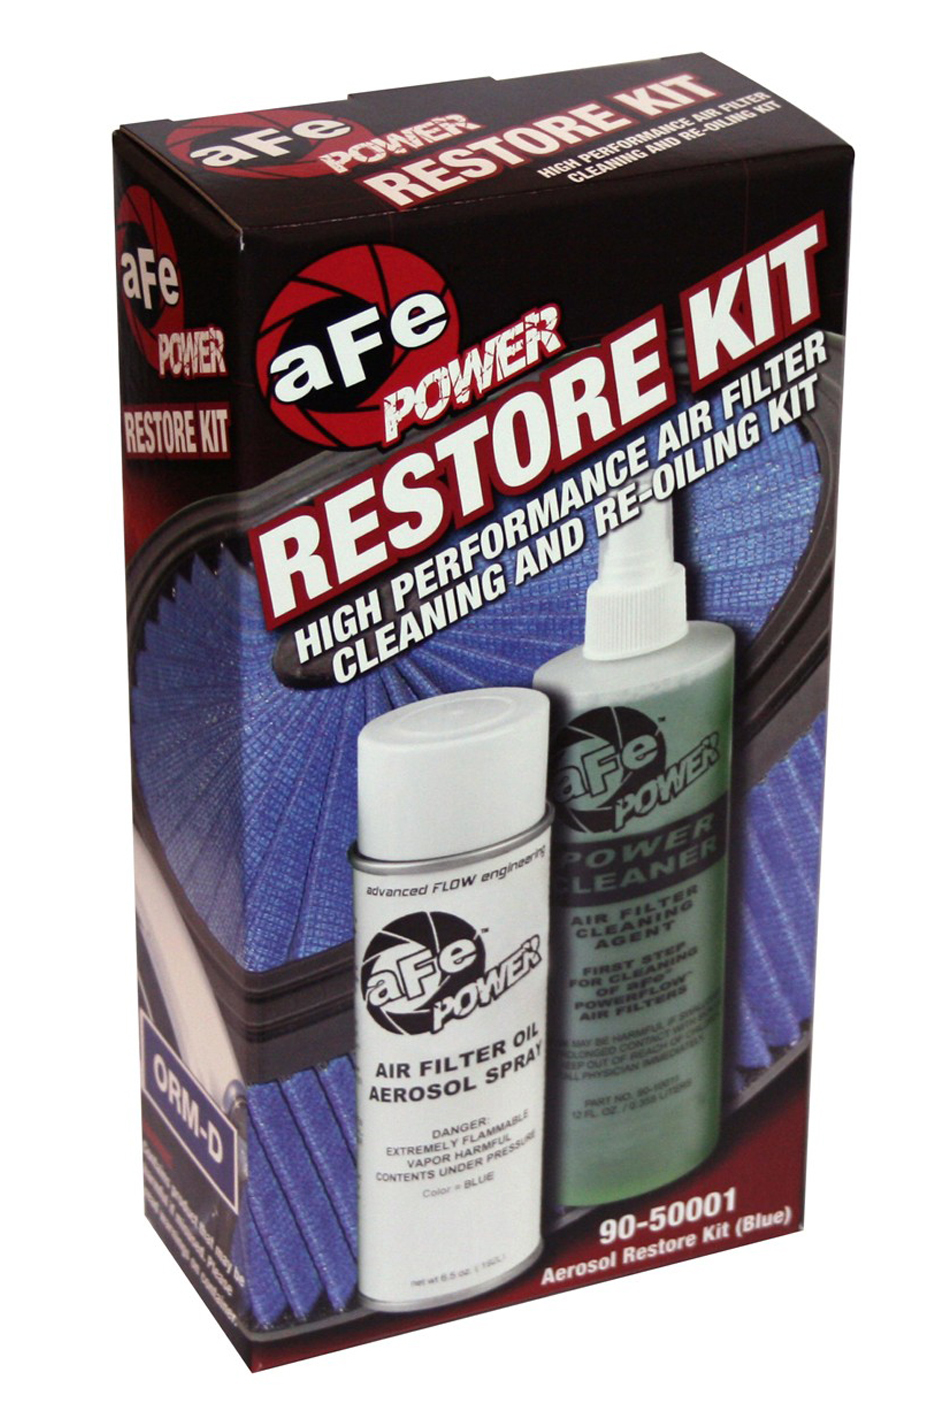 Air Filter Cleaning Kit Blue Oil Aerosol